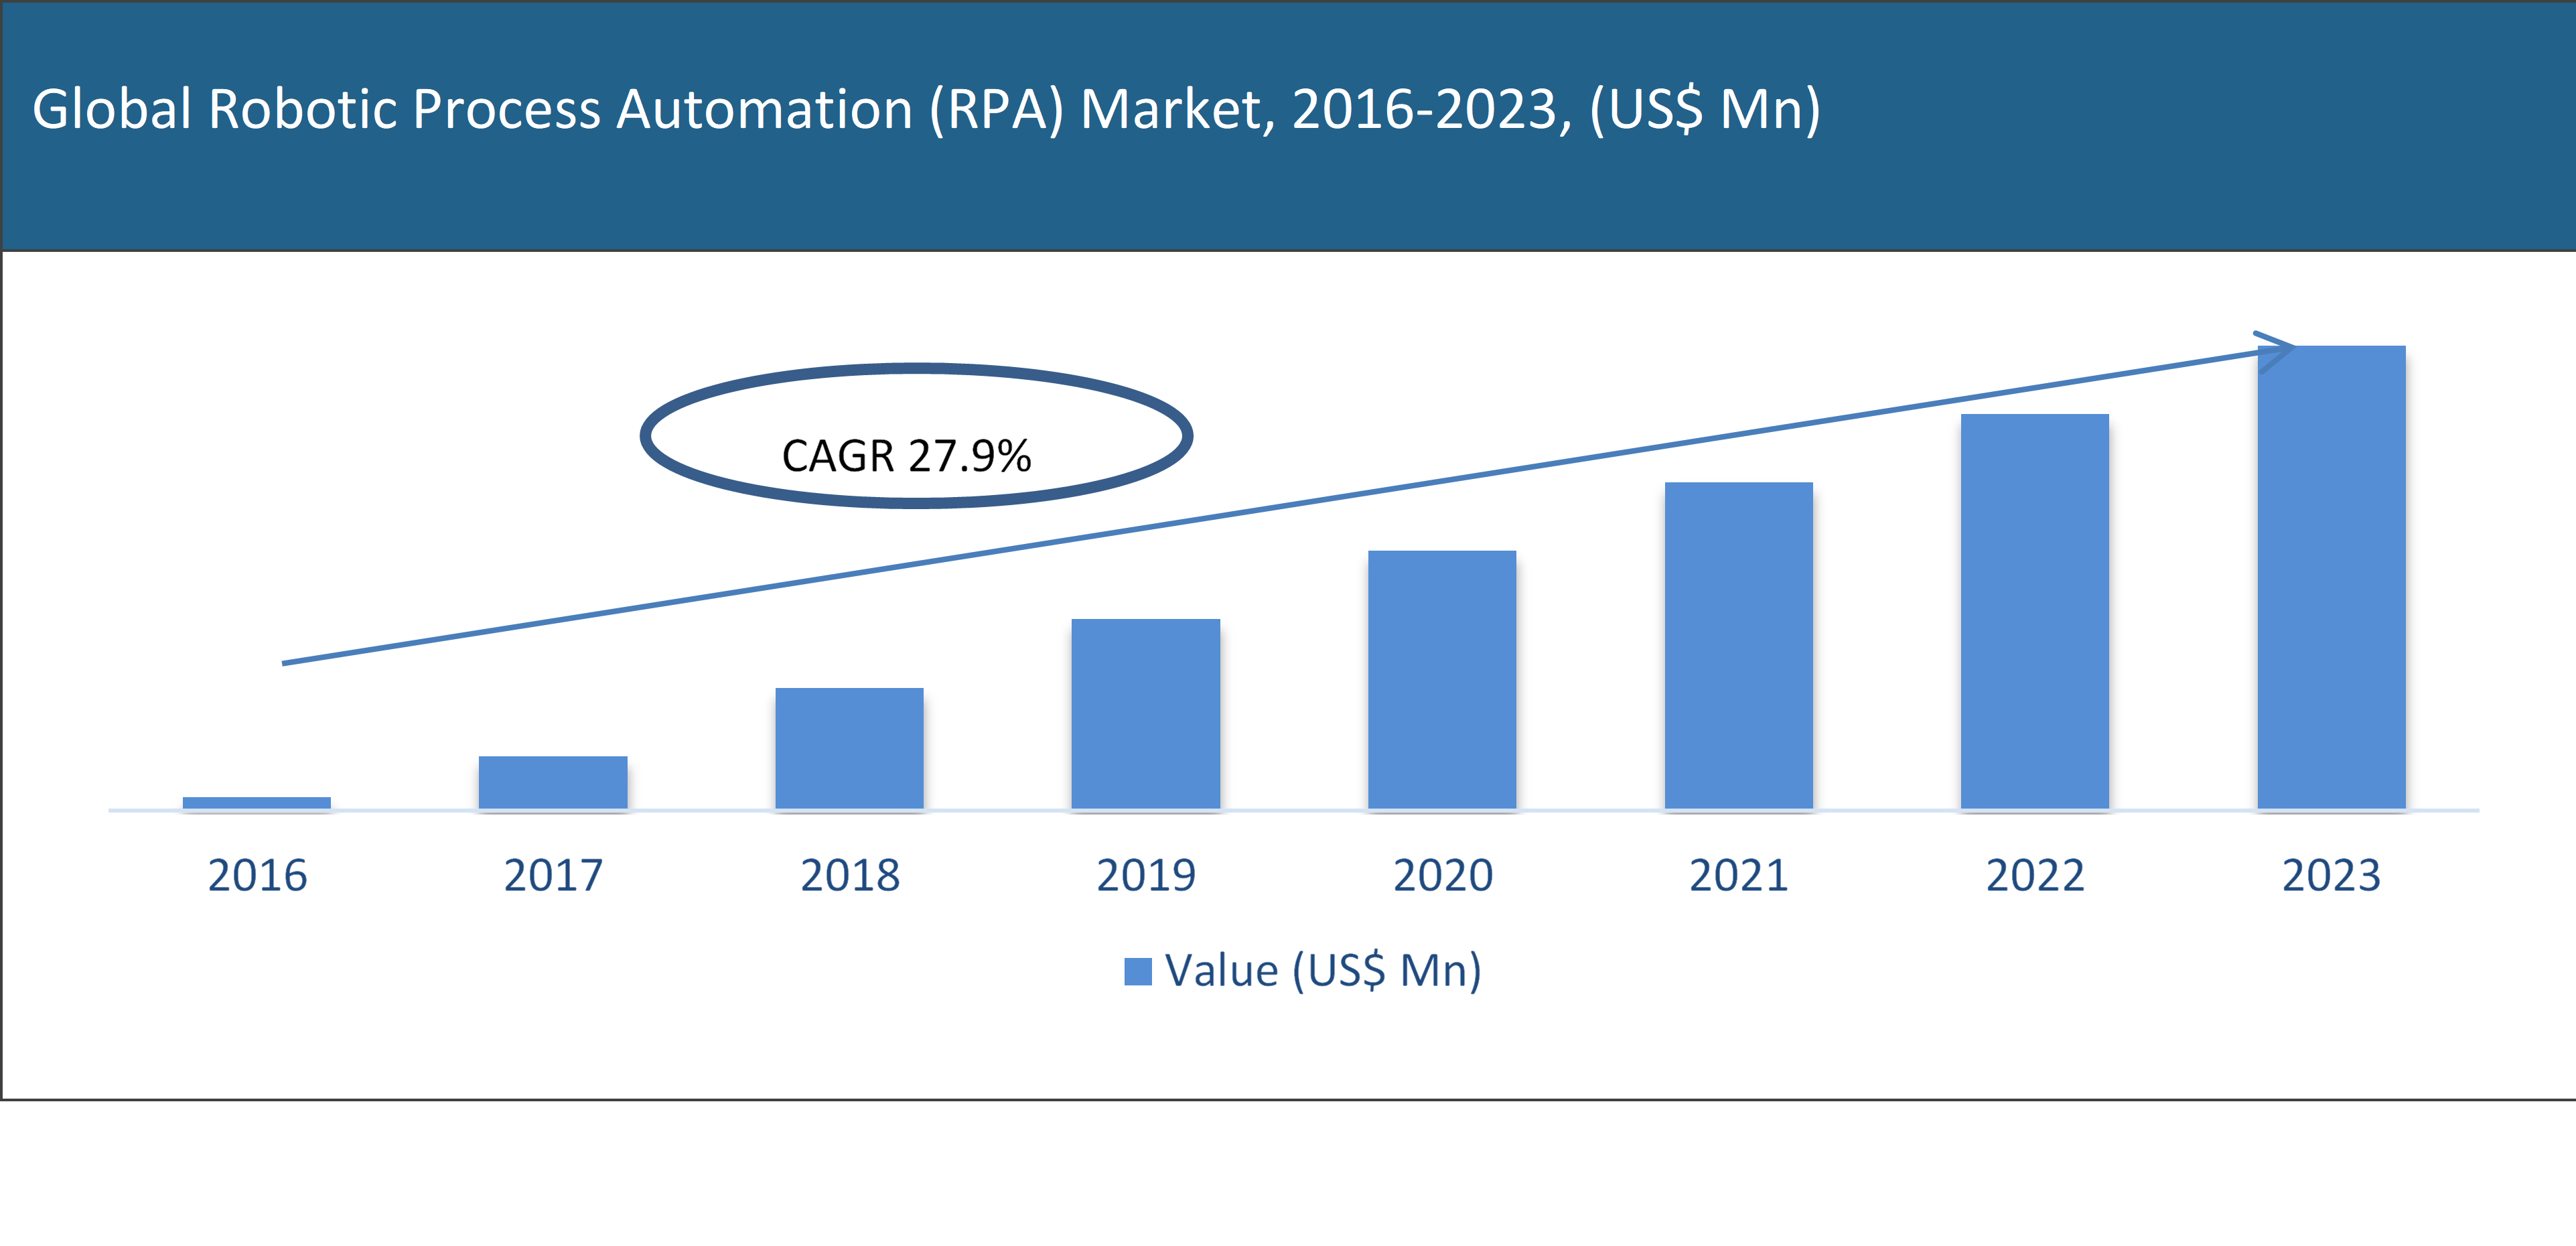 Global Robotic Process Automation (RPA) Market